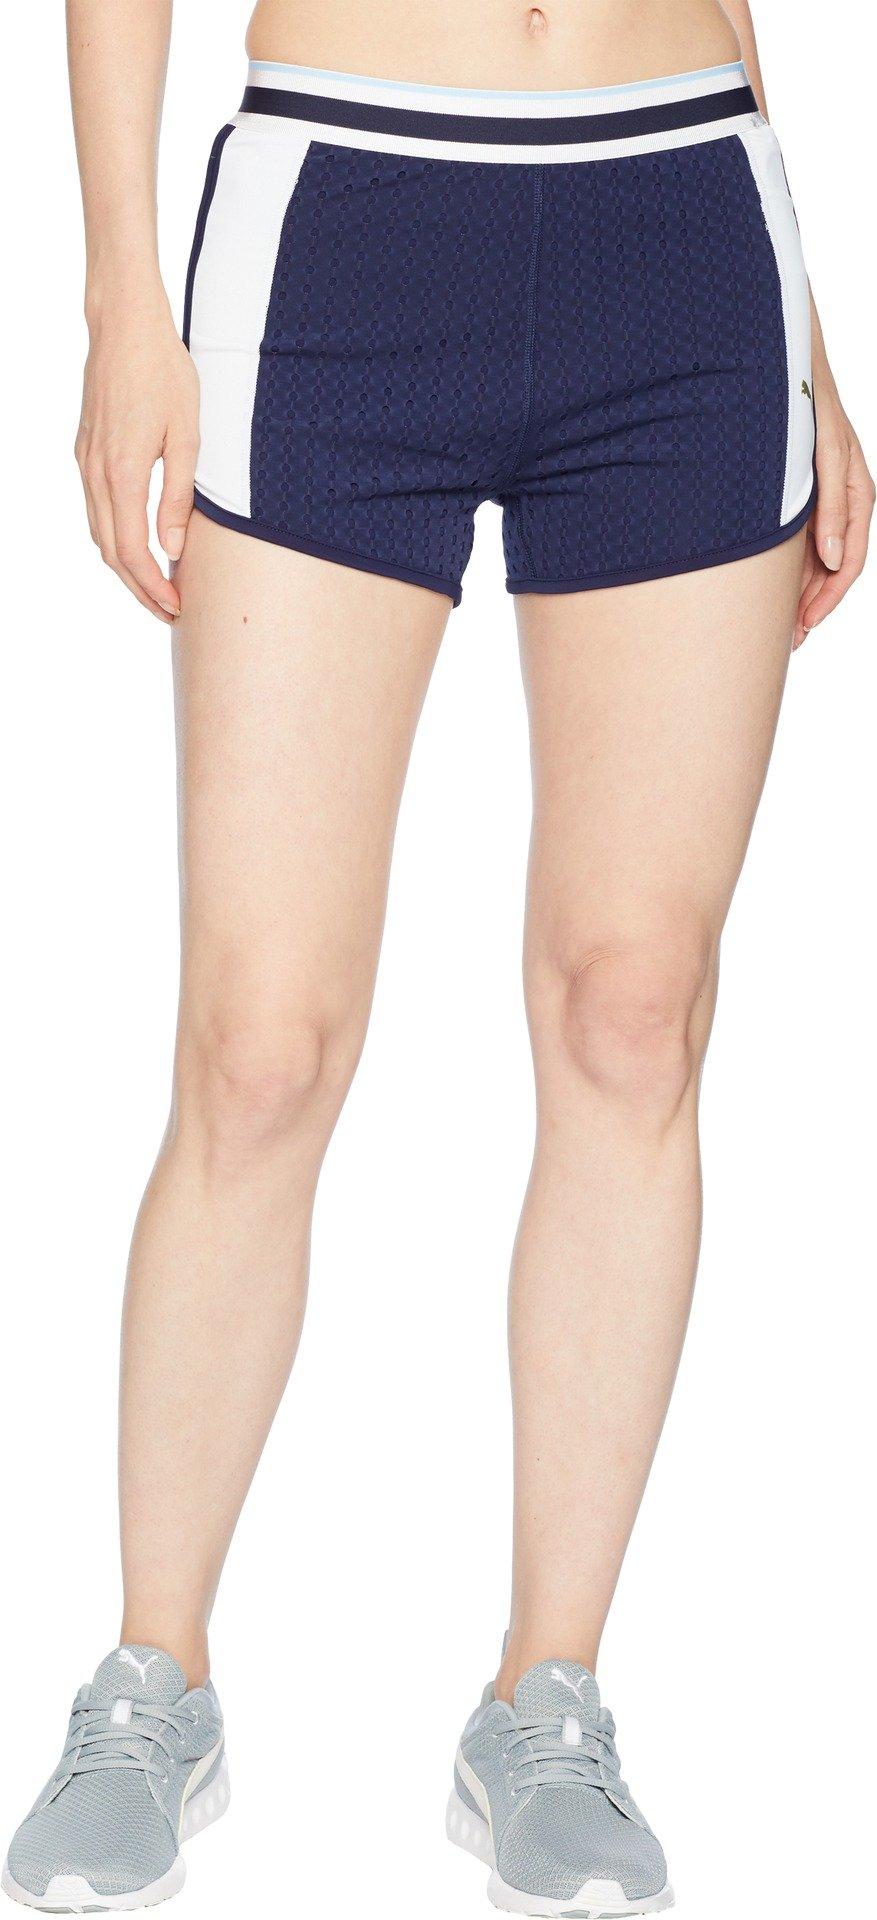 PUMA Women's Varsity Shorts Peacoat Large 2